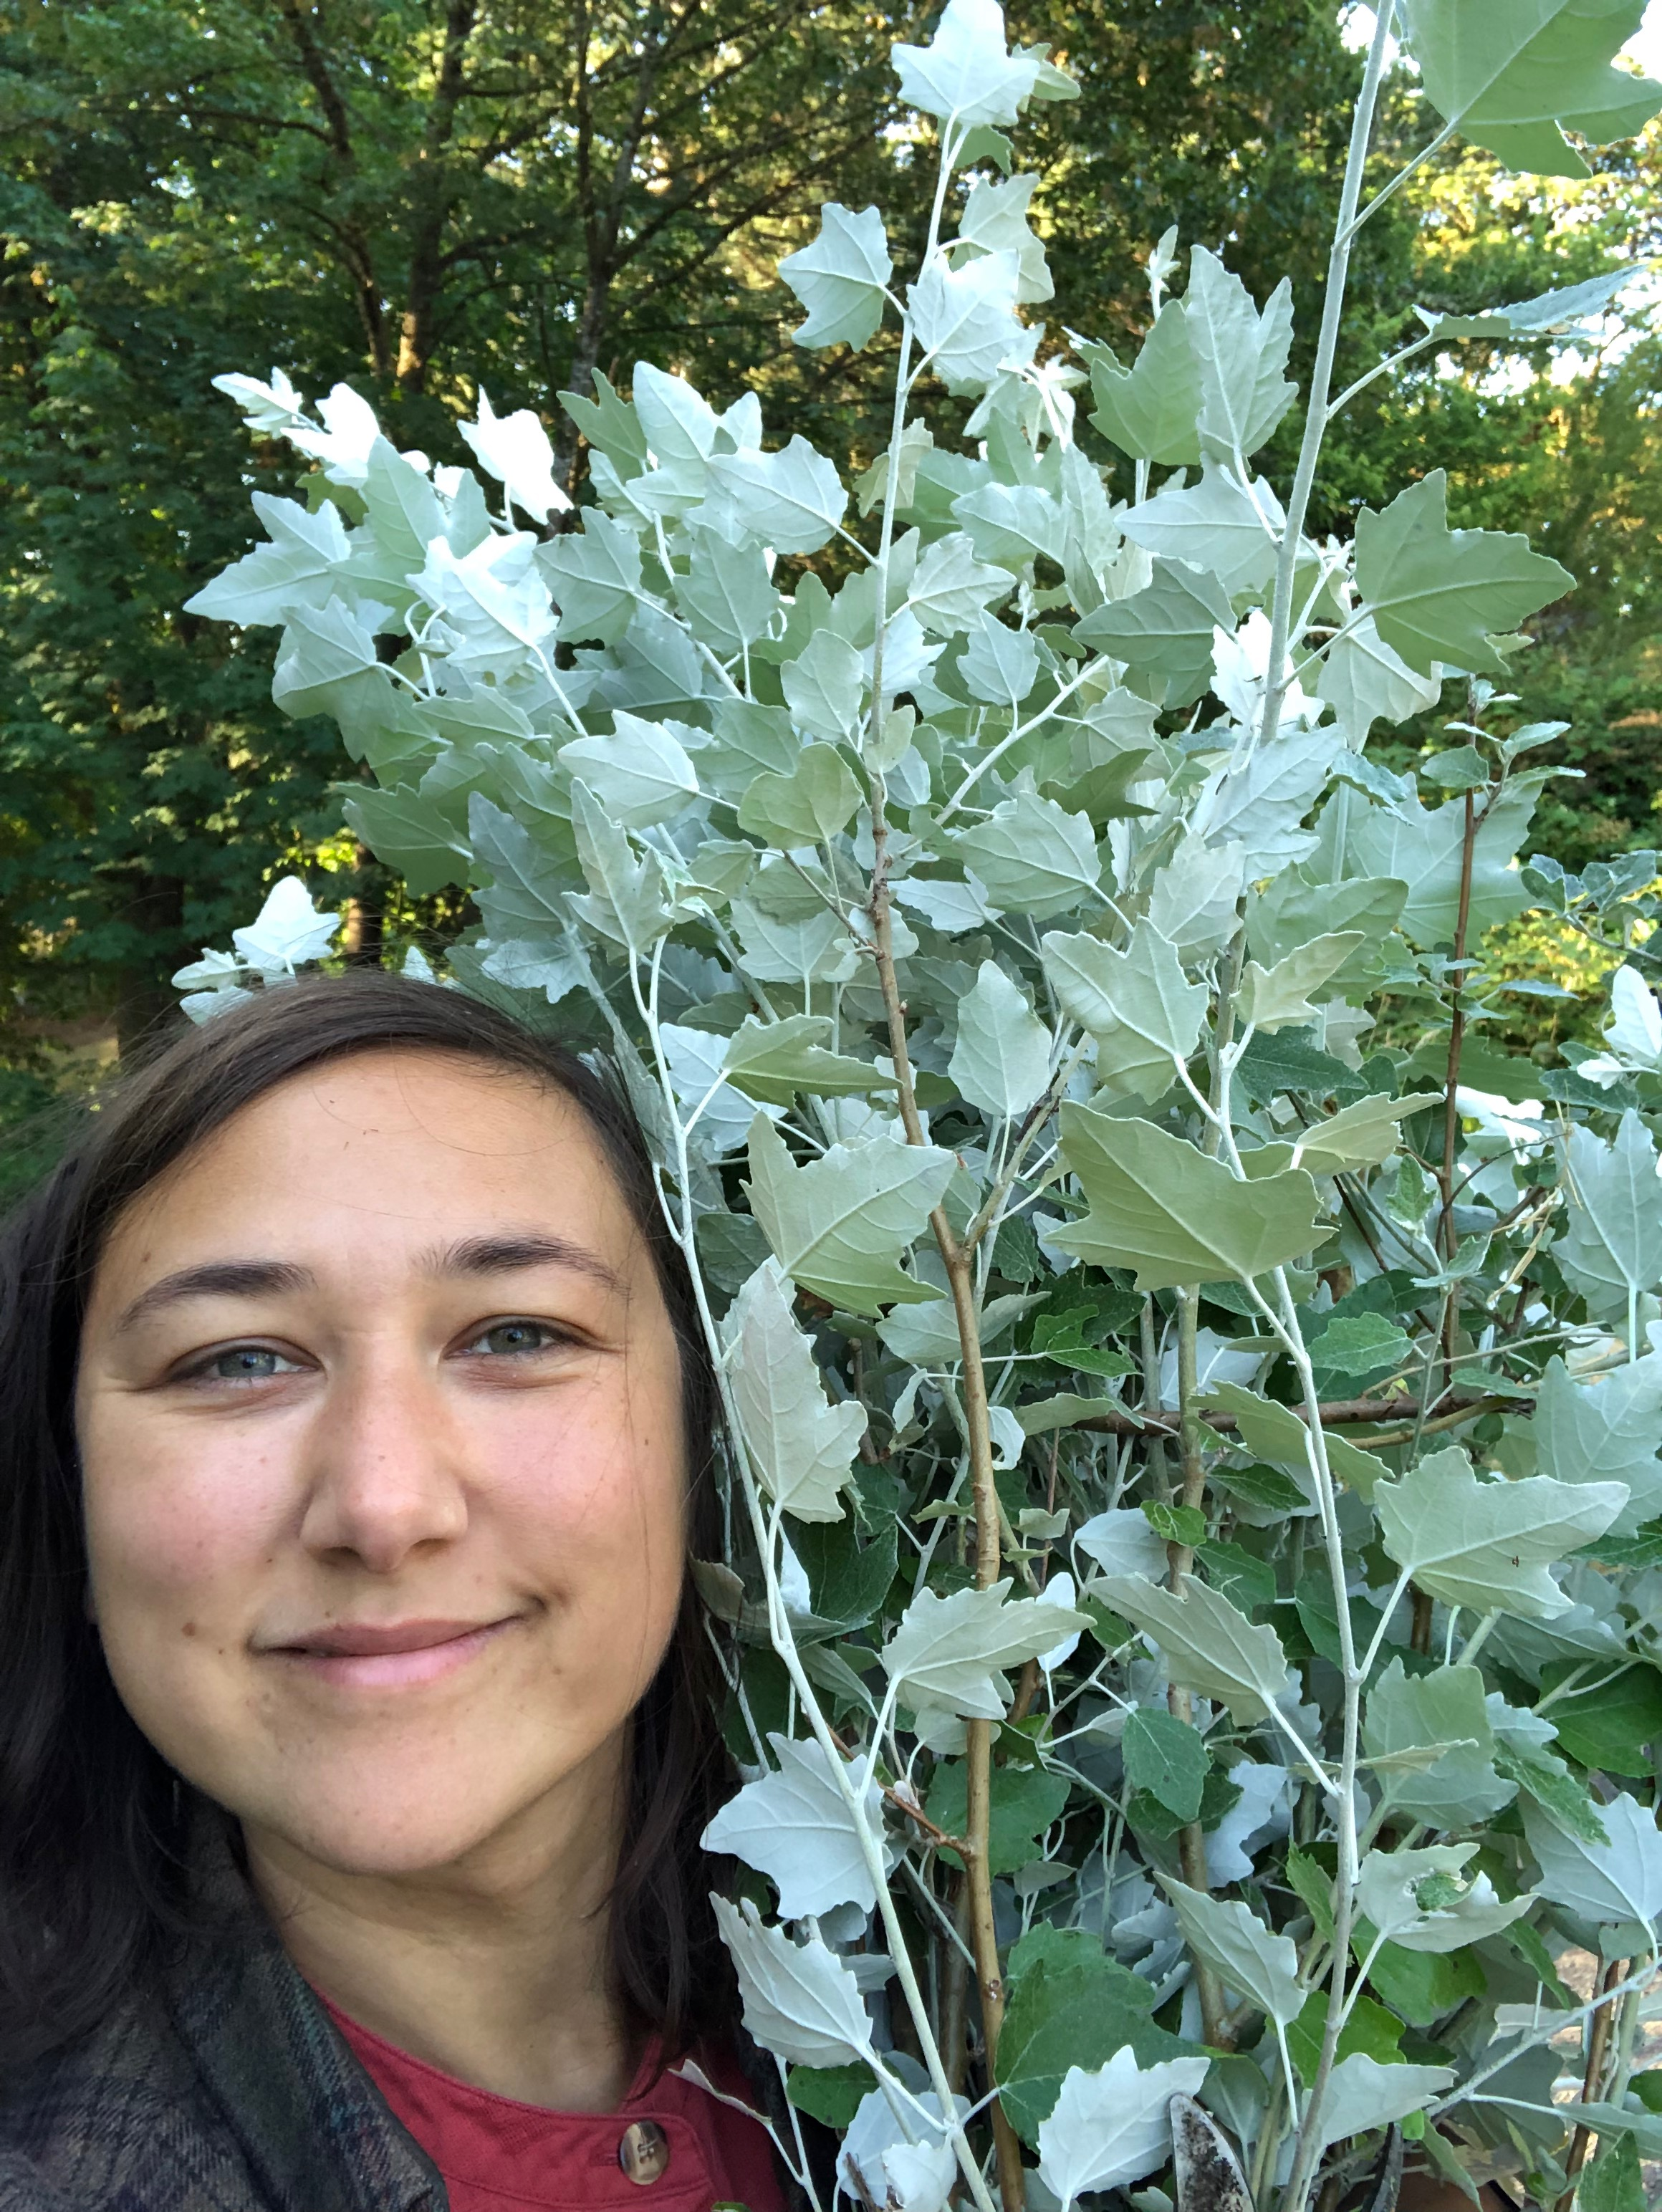 "Here, I bring in white poplar foliage from the yard. I love a ""yard haul"" best!"